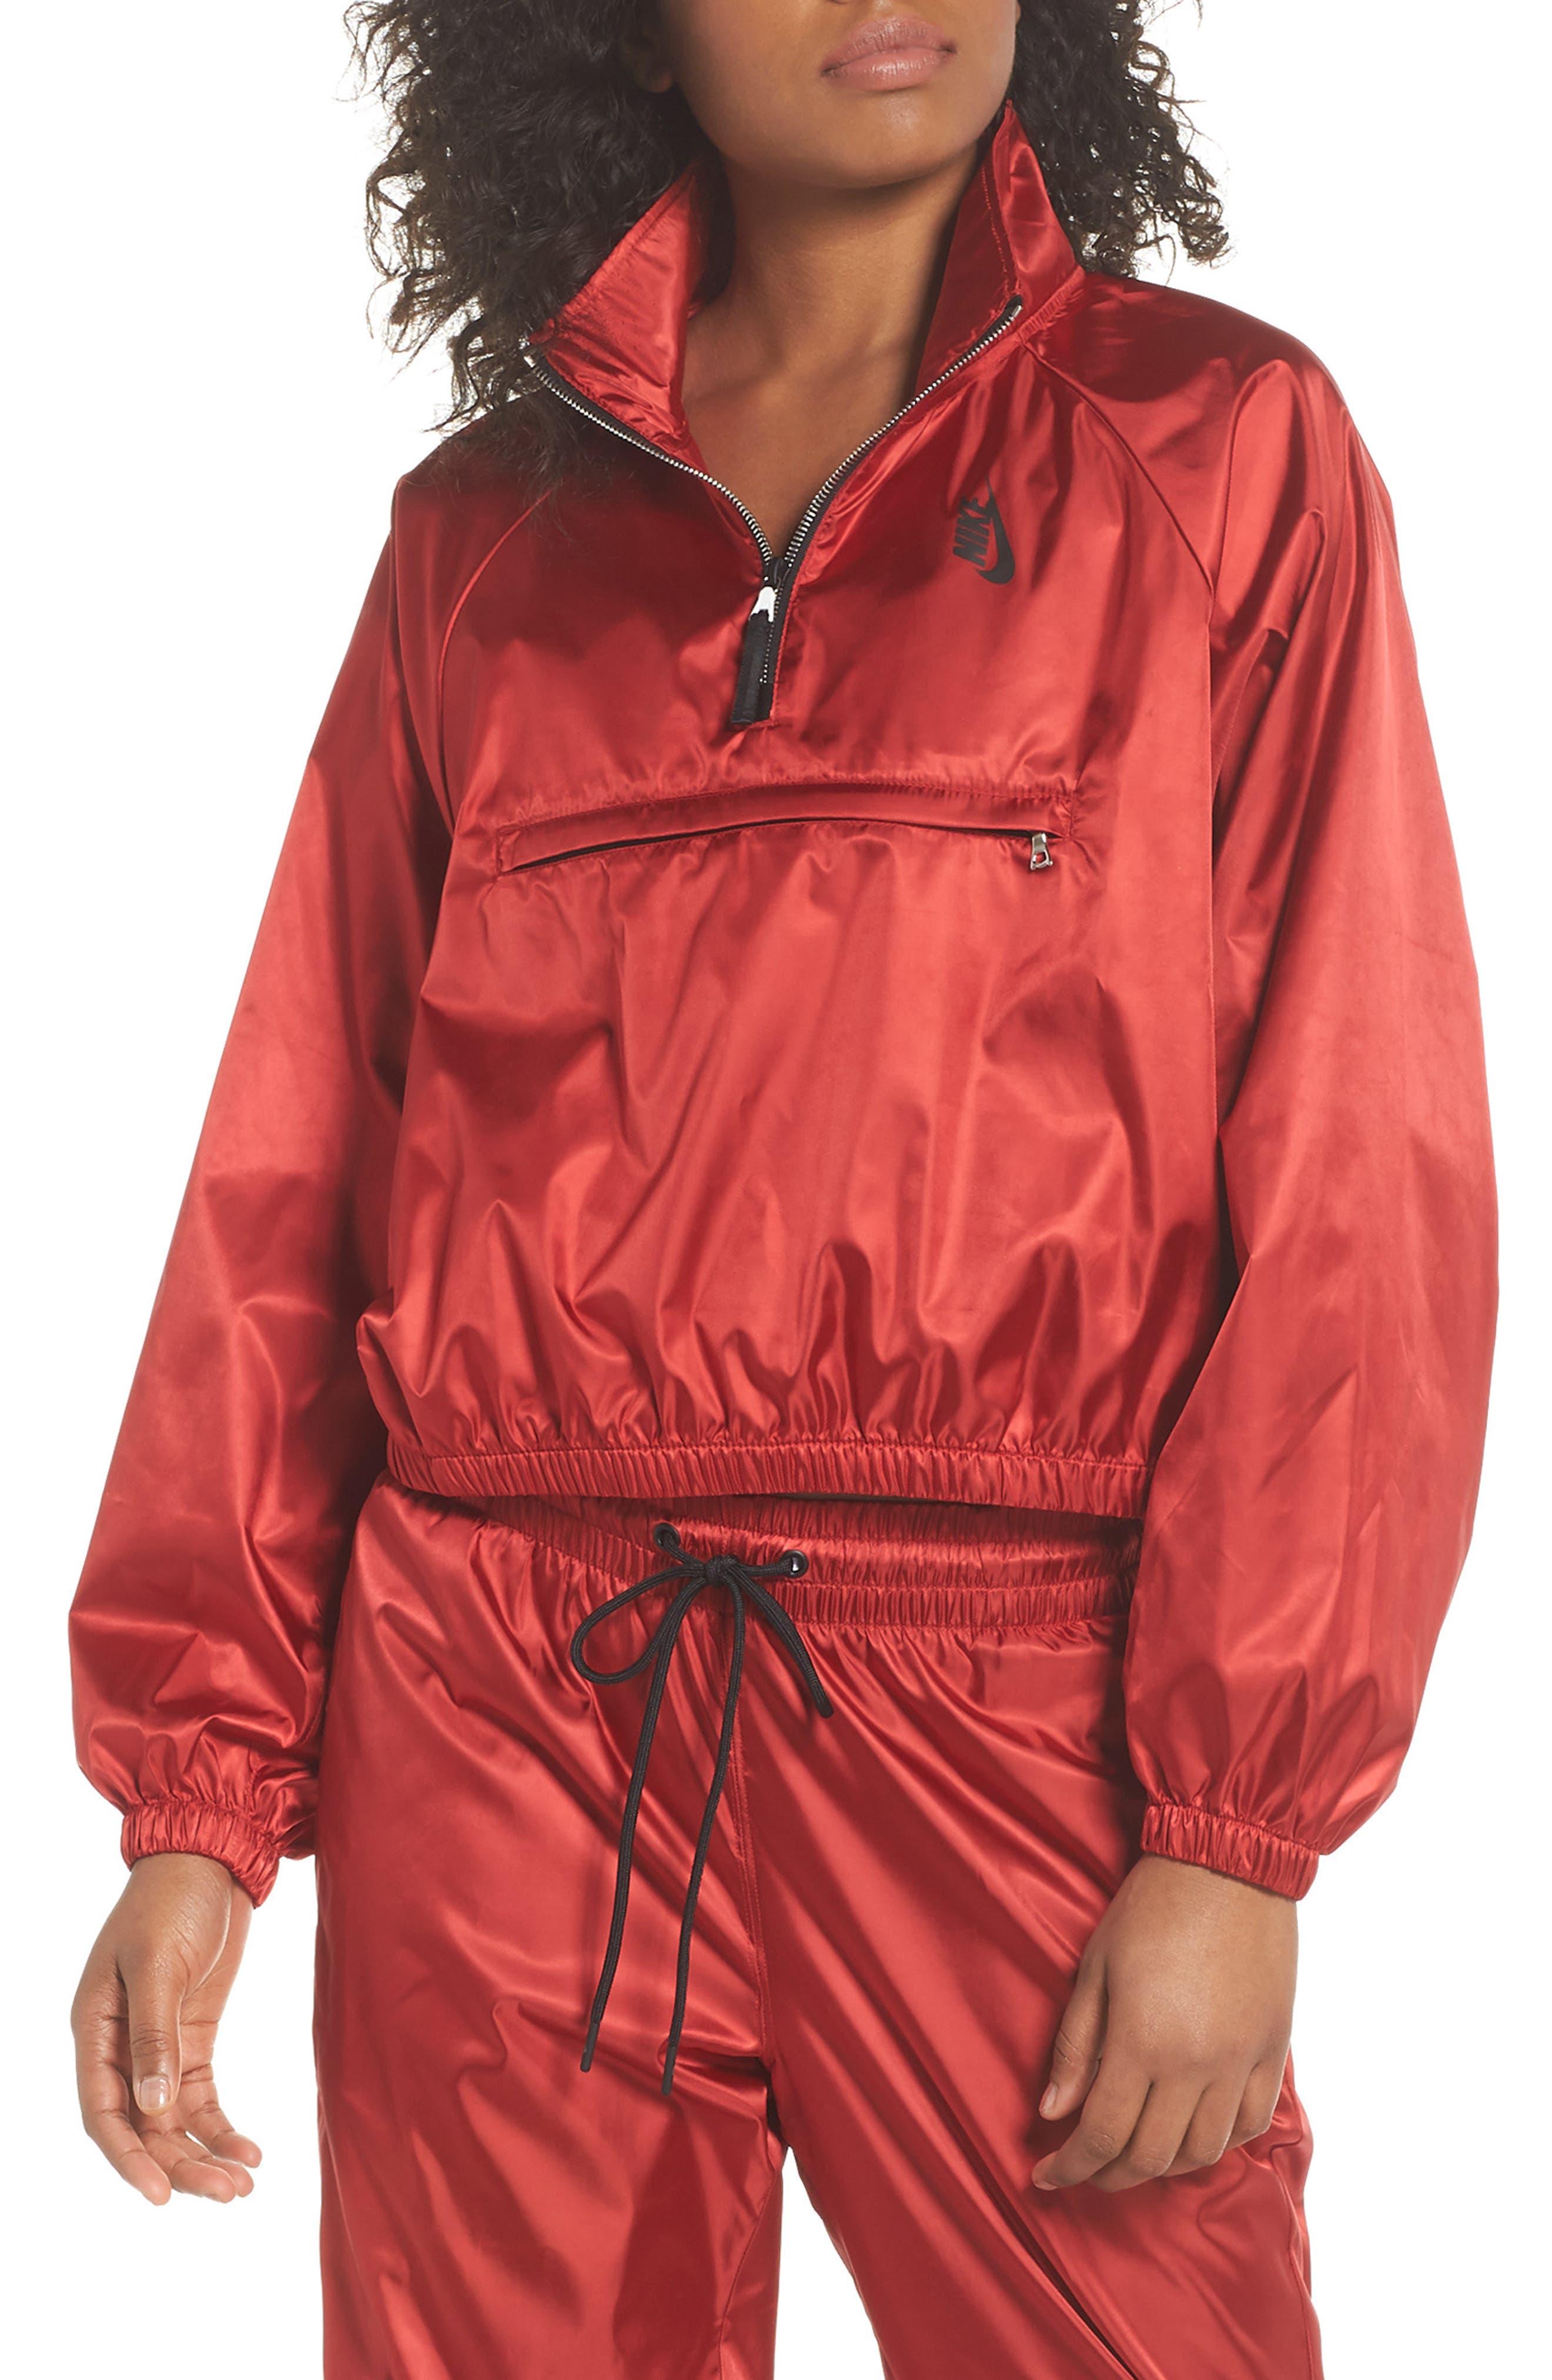 NikeLab Collection Satin Half Zip Top,                         Main,                         color, Gym Red/ Black